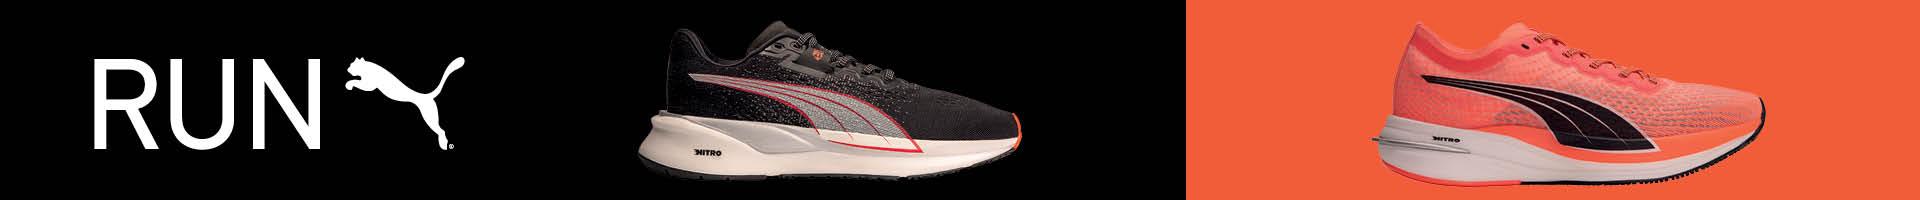 Puma Spark Run Range | The Athlete's Foot